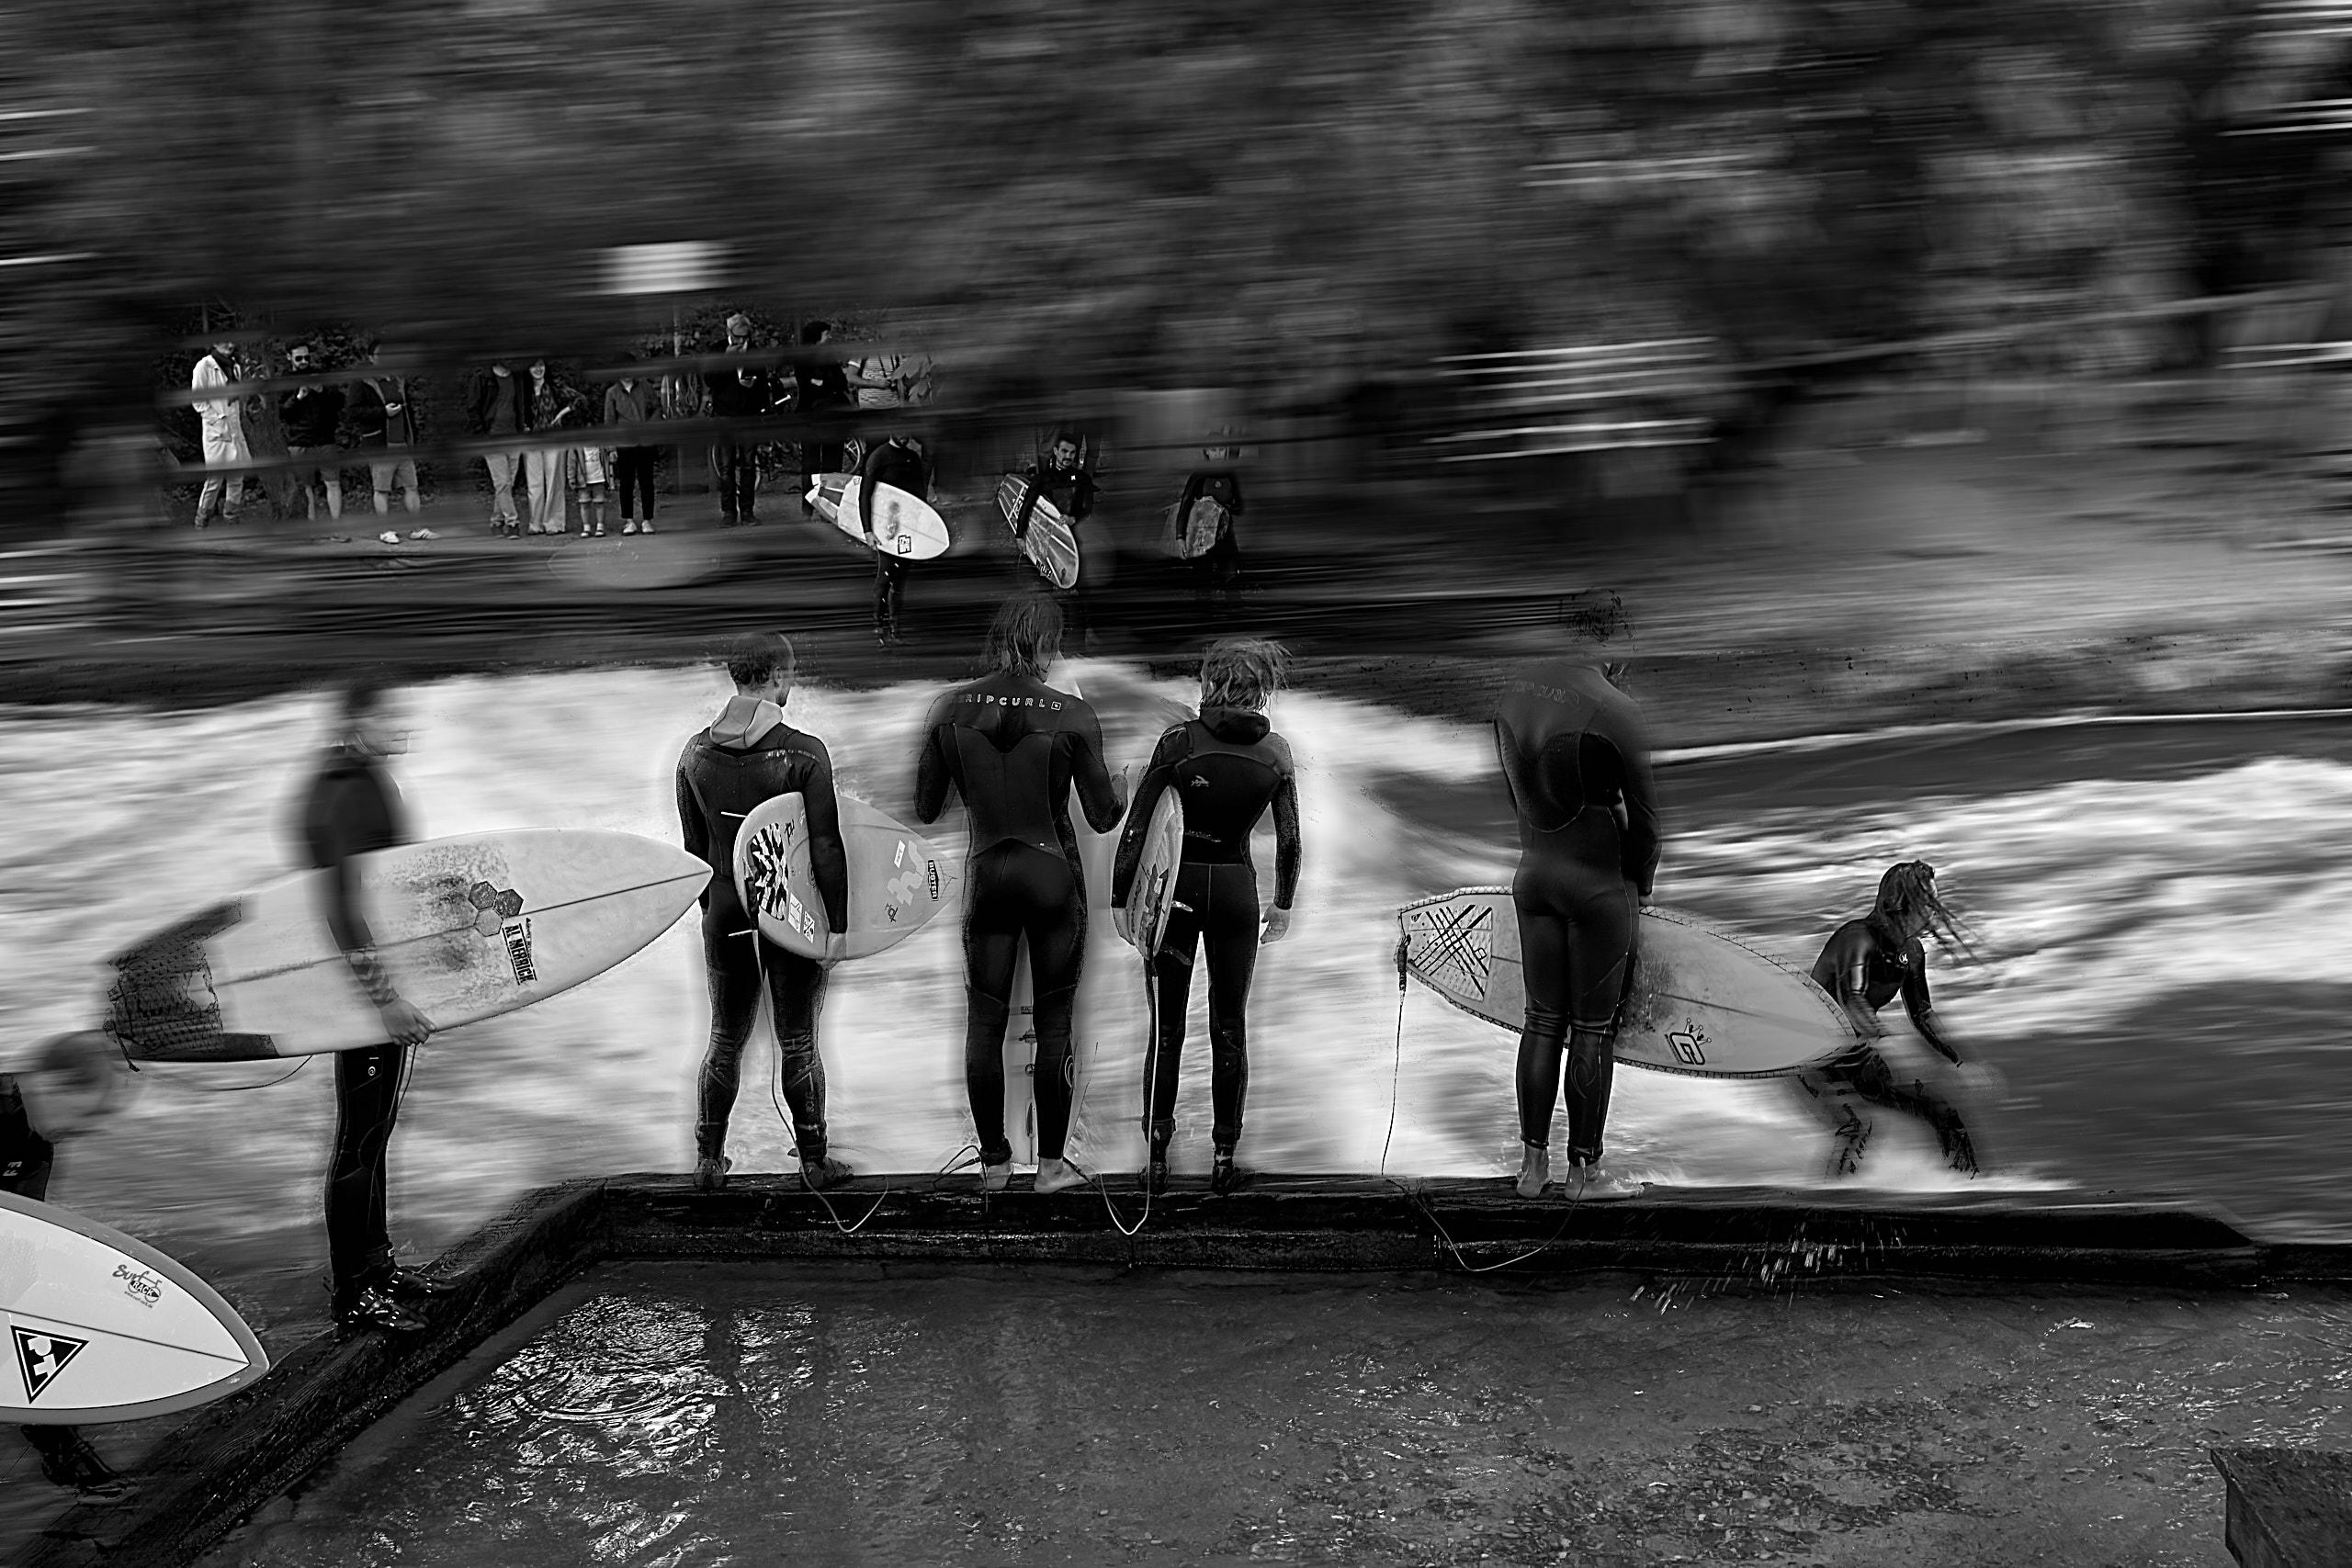 © 2018 Helge Hasenau, StreetMoment #007 - Warteschlange am Eisbach